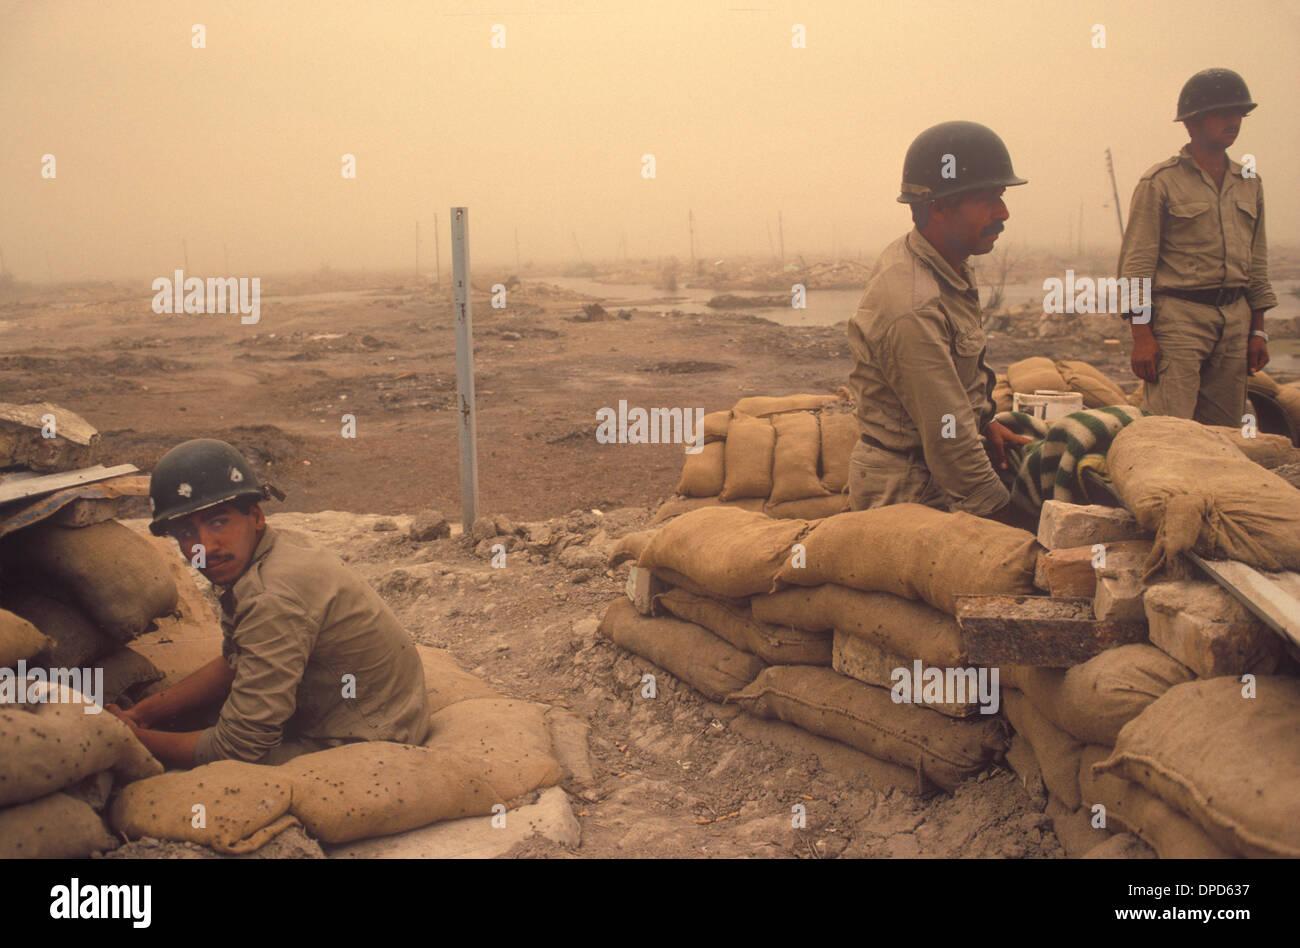 Iran Iraq War Also Known As First Persian Gulf War